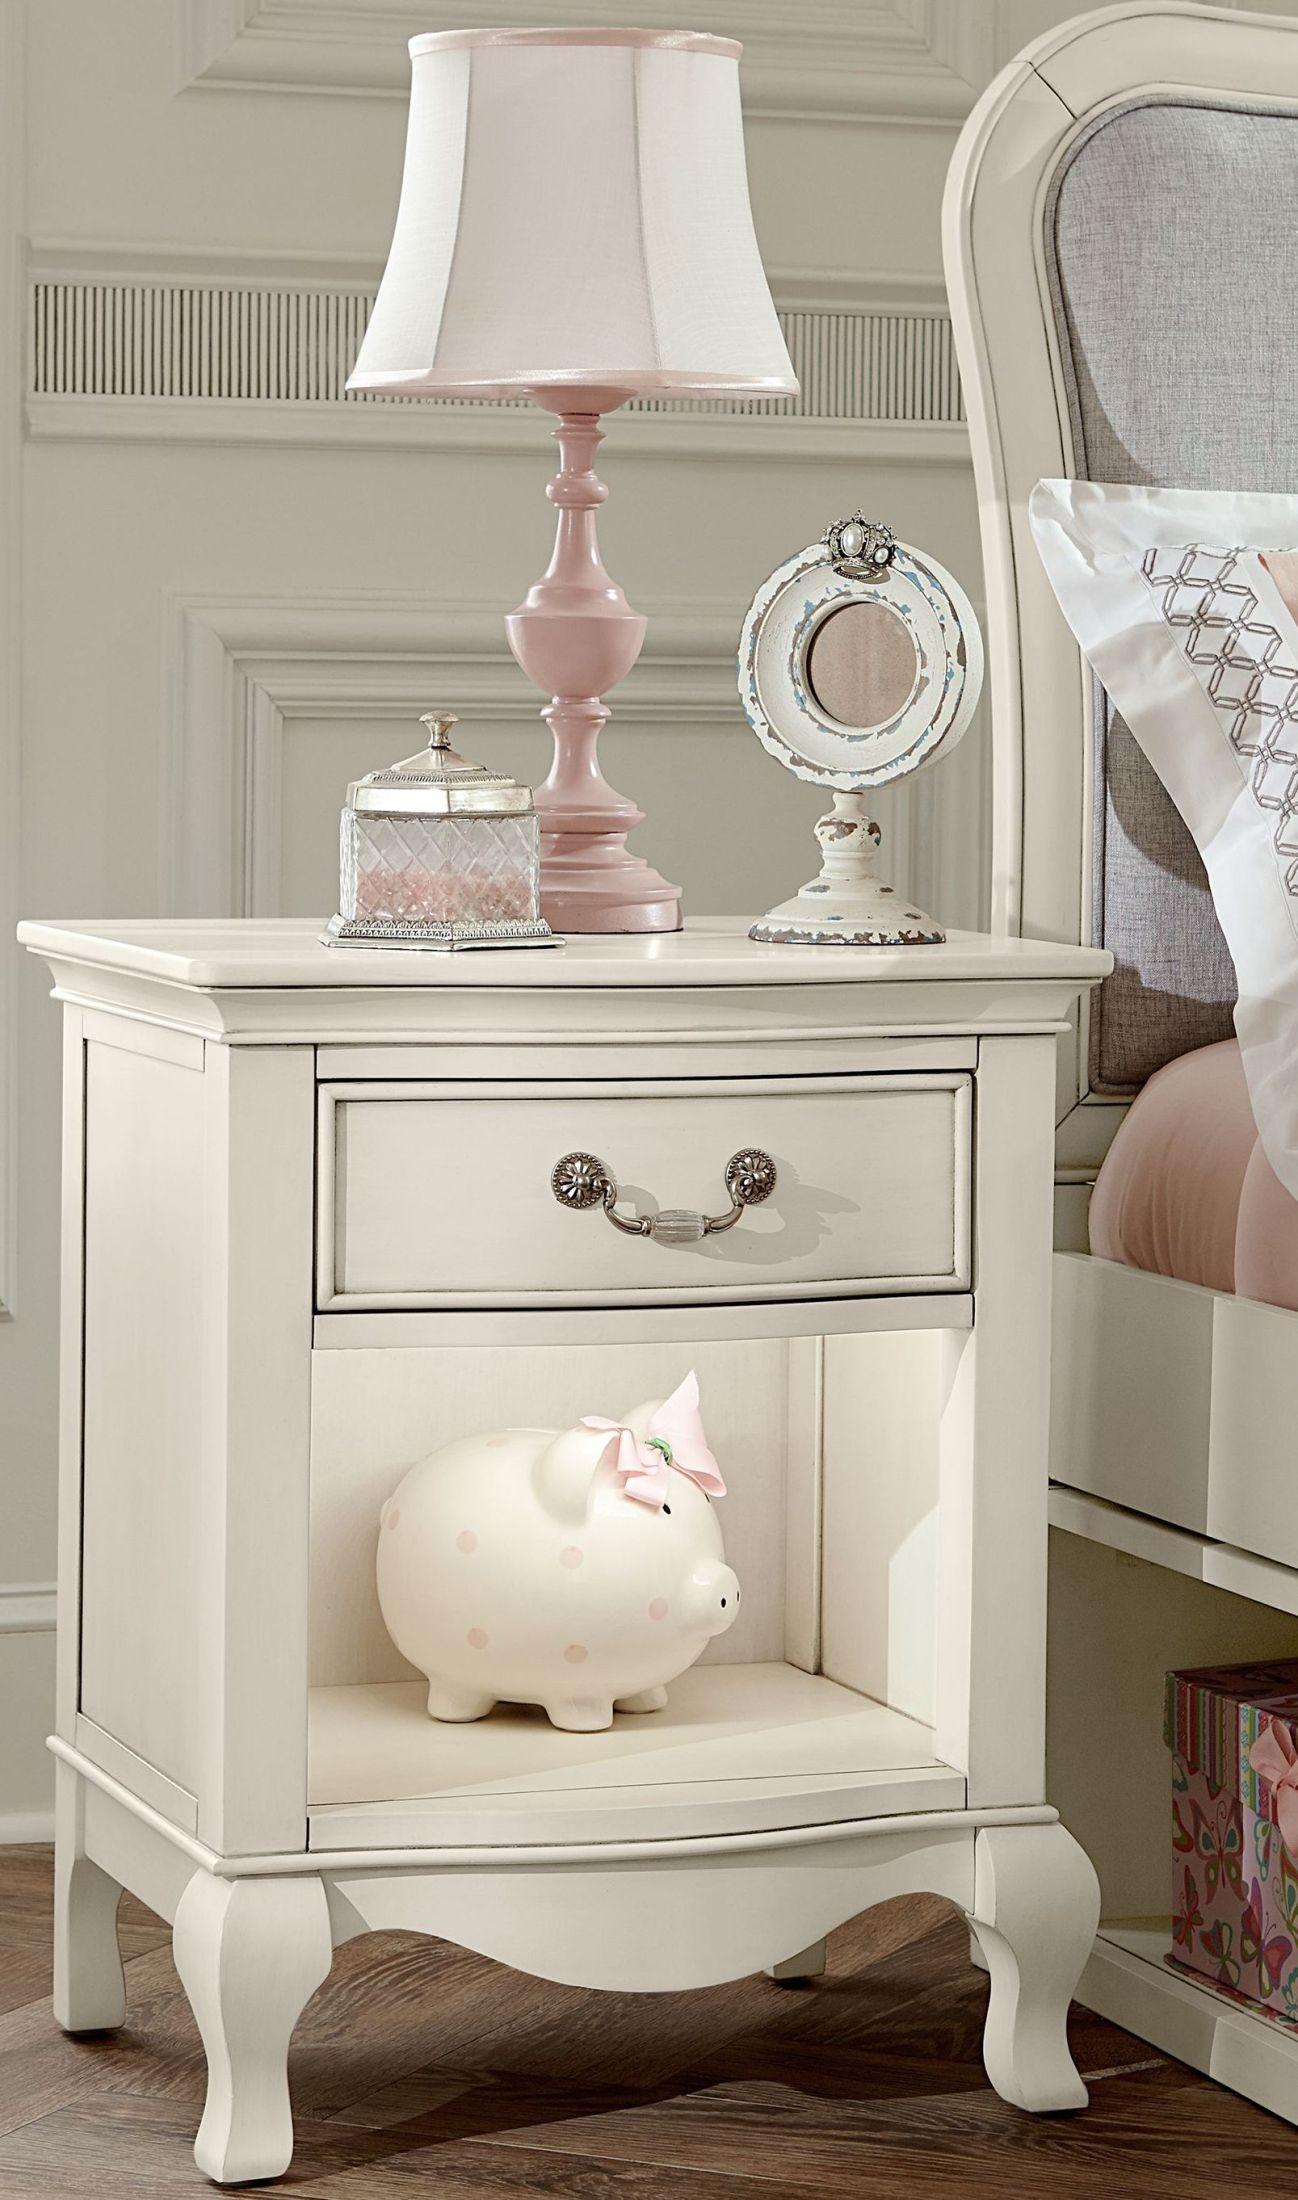 kensington antique white nightstand from ne kids coleman furniture. Black Bedroom Furniture Sets. Home Design Ideas